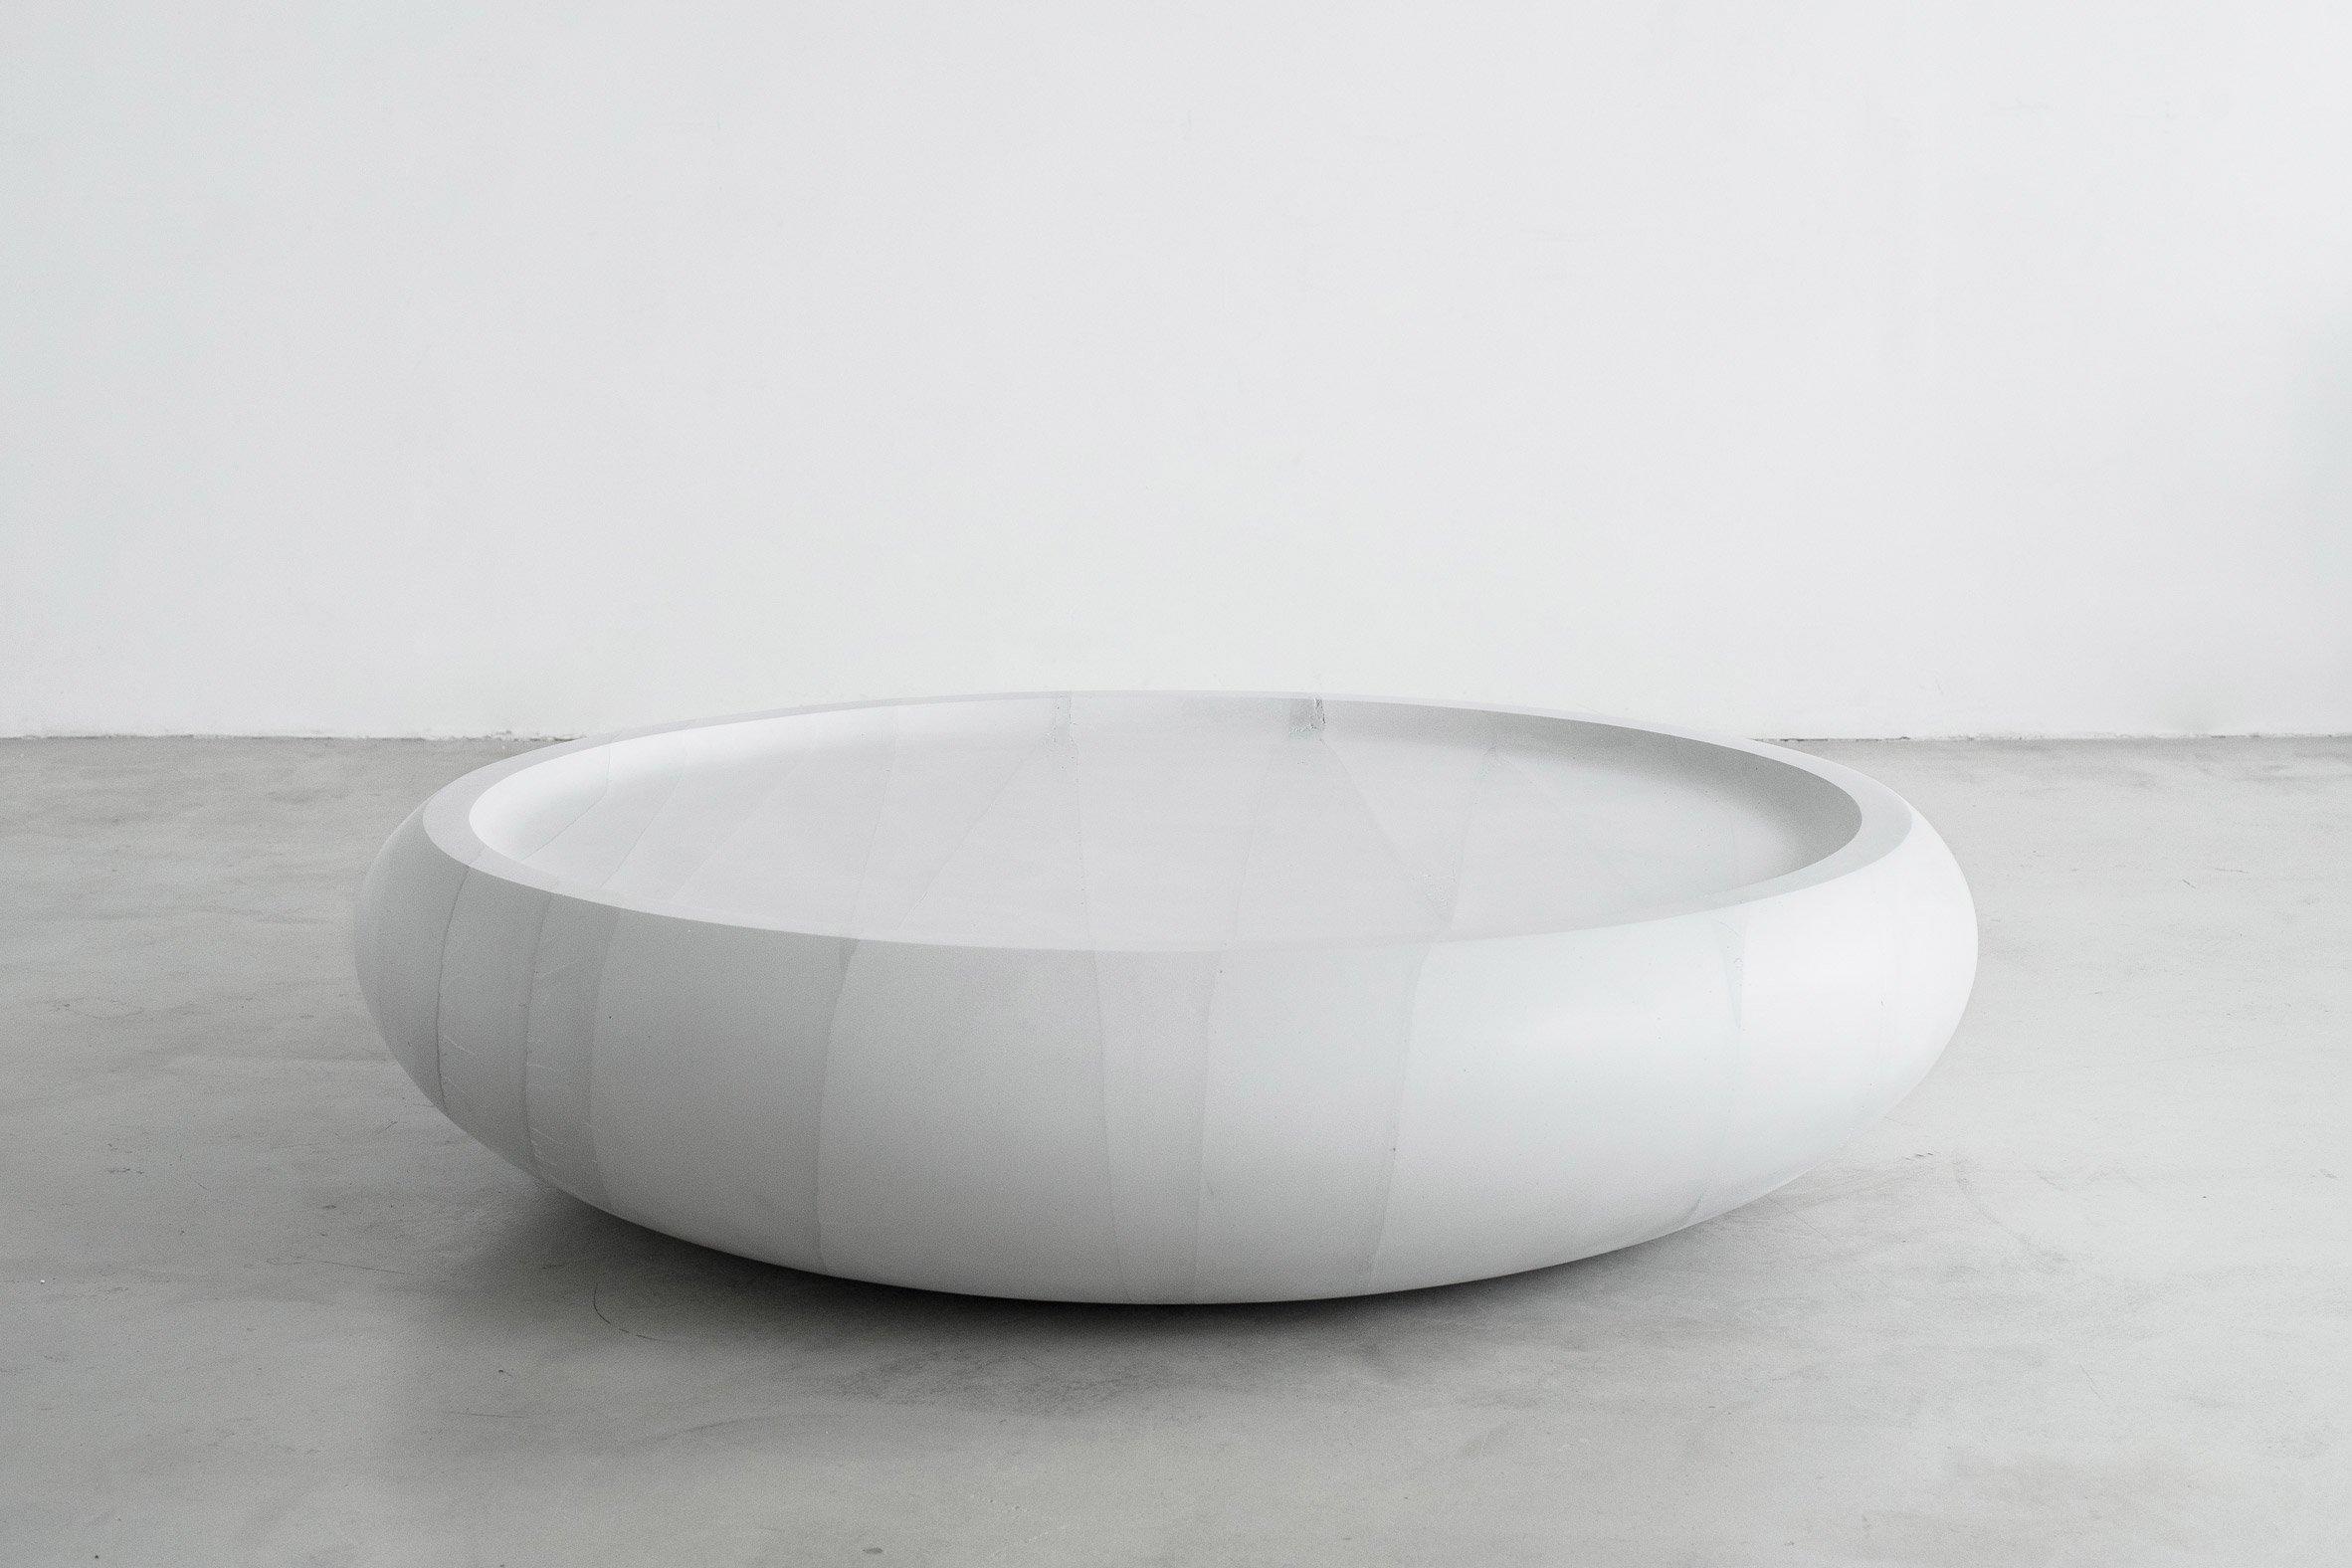 ghost-thaw-furniture-fernando-mastrangelo-collection-new-york-cast_dezeen_2364_col_12